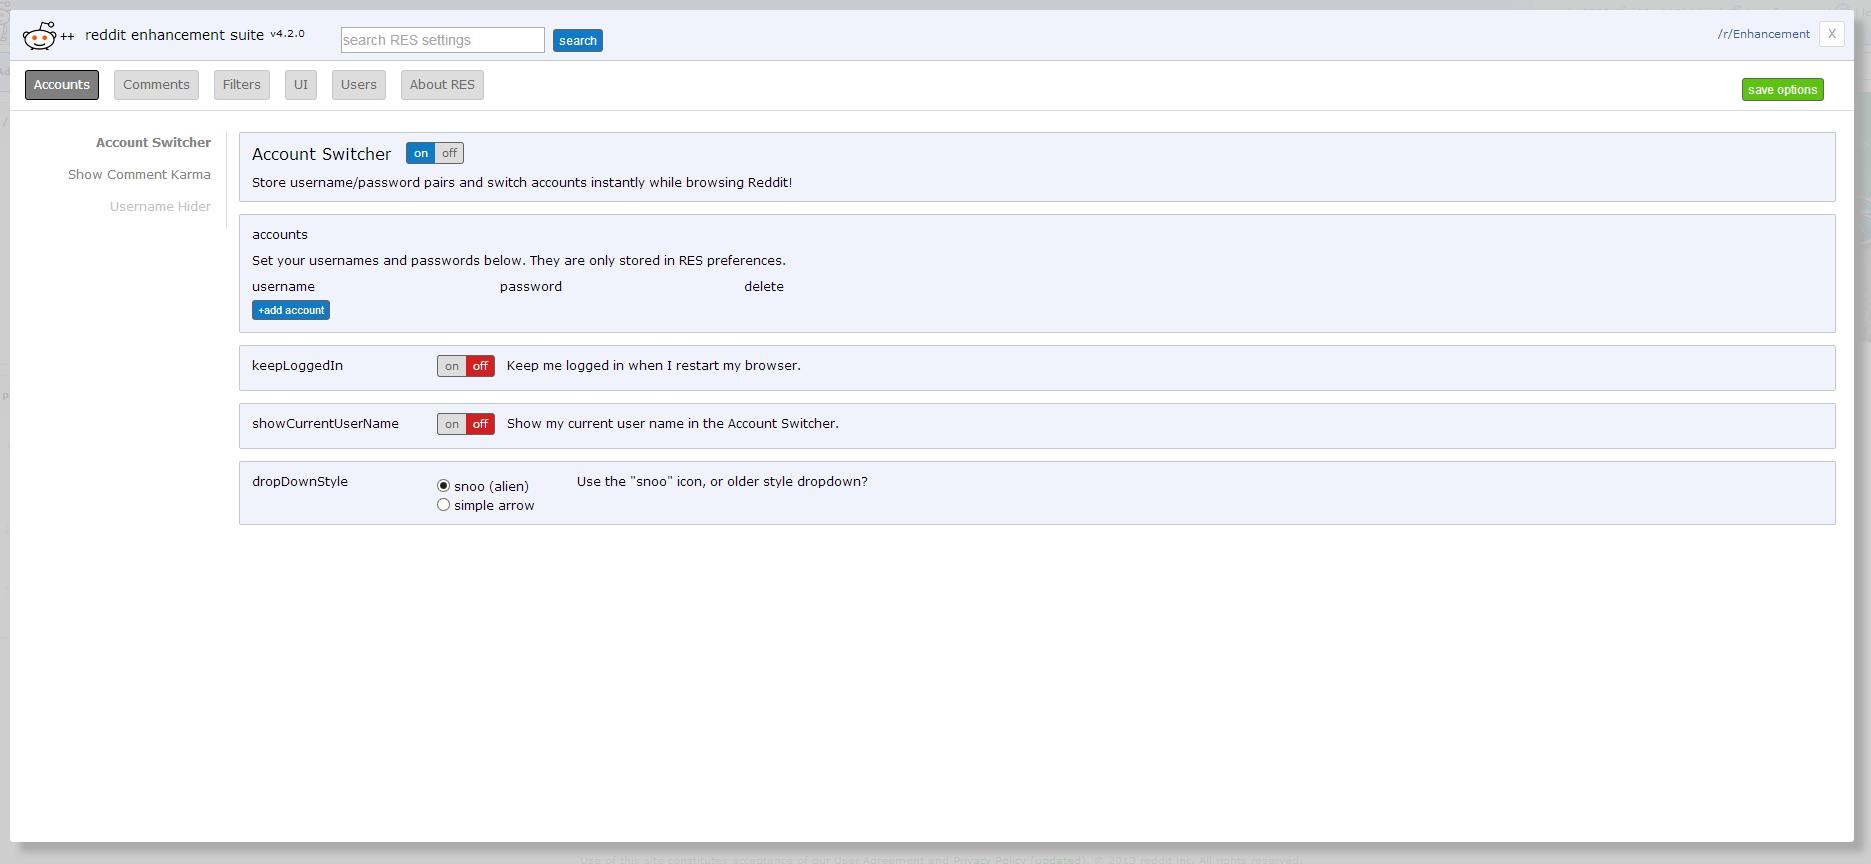 Review: Reddit Enhancement Suite makes Reddit browsing easier and more ...